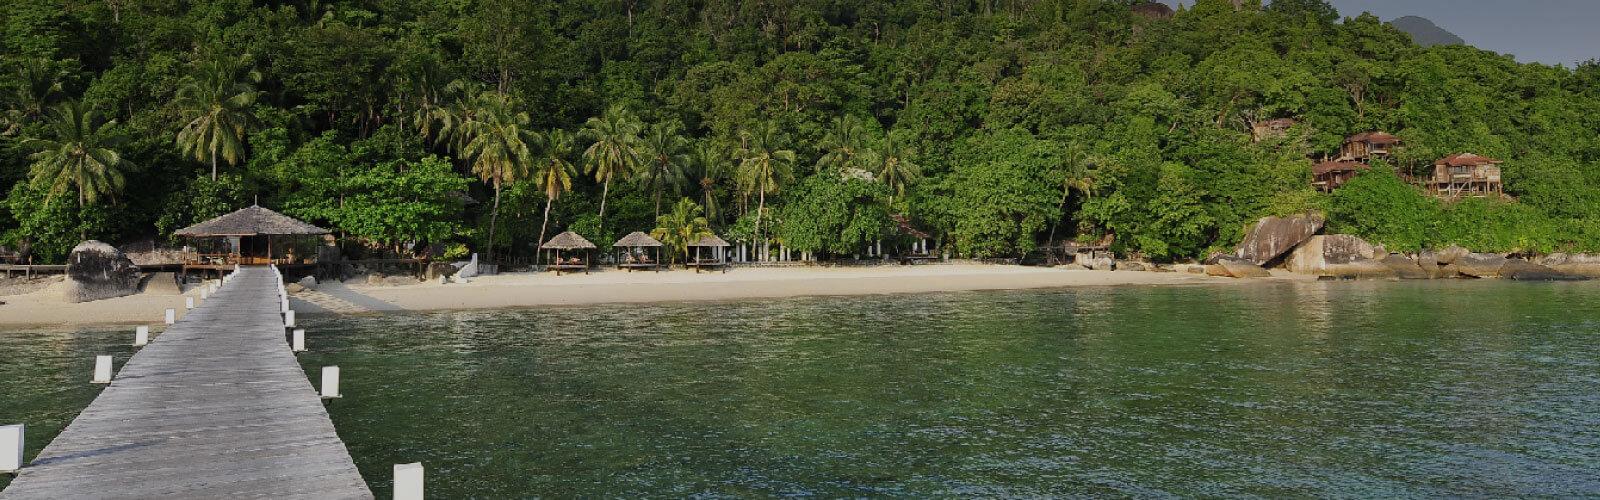 Japamala Resorts Tioman Island